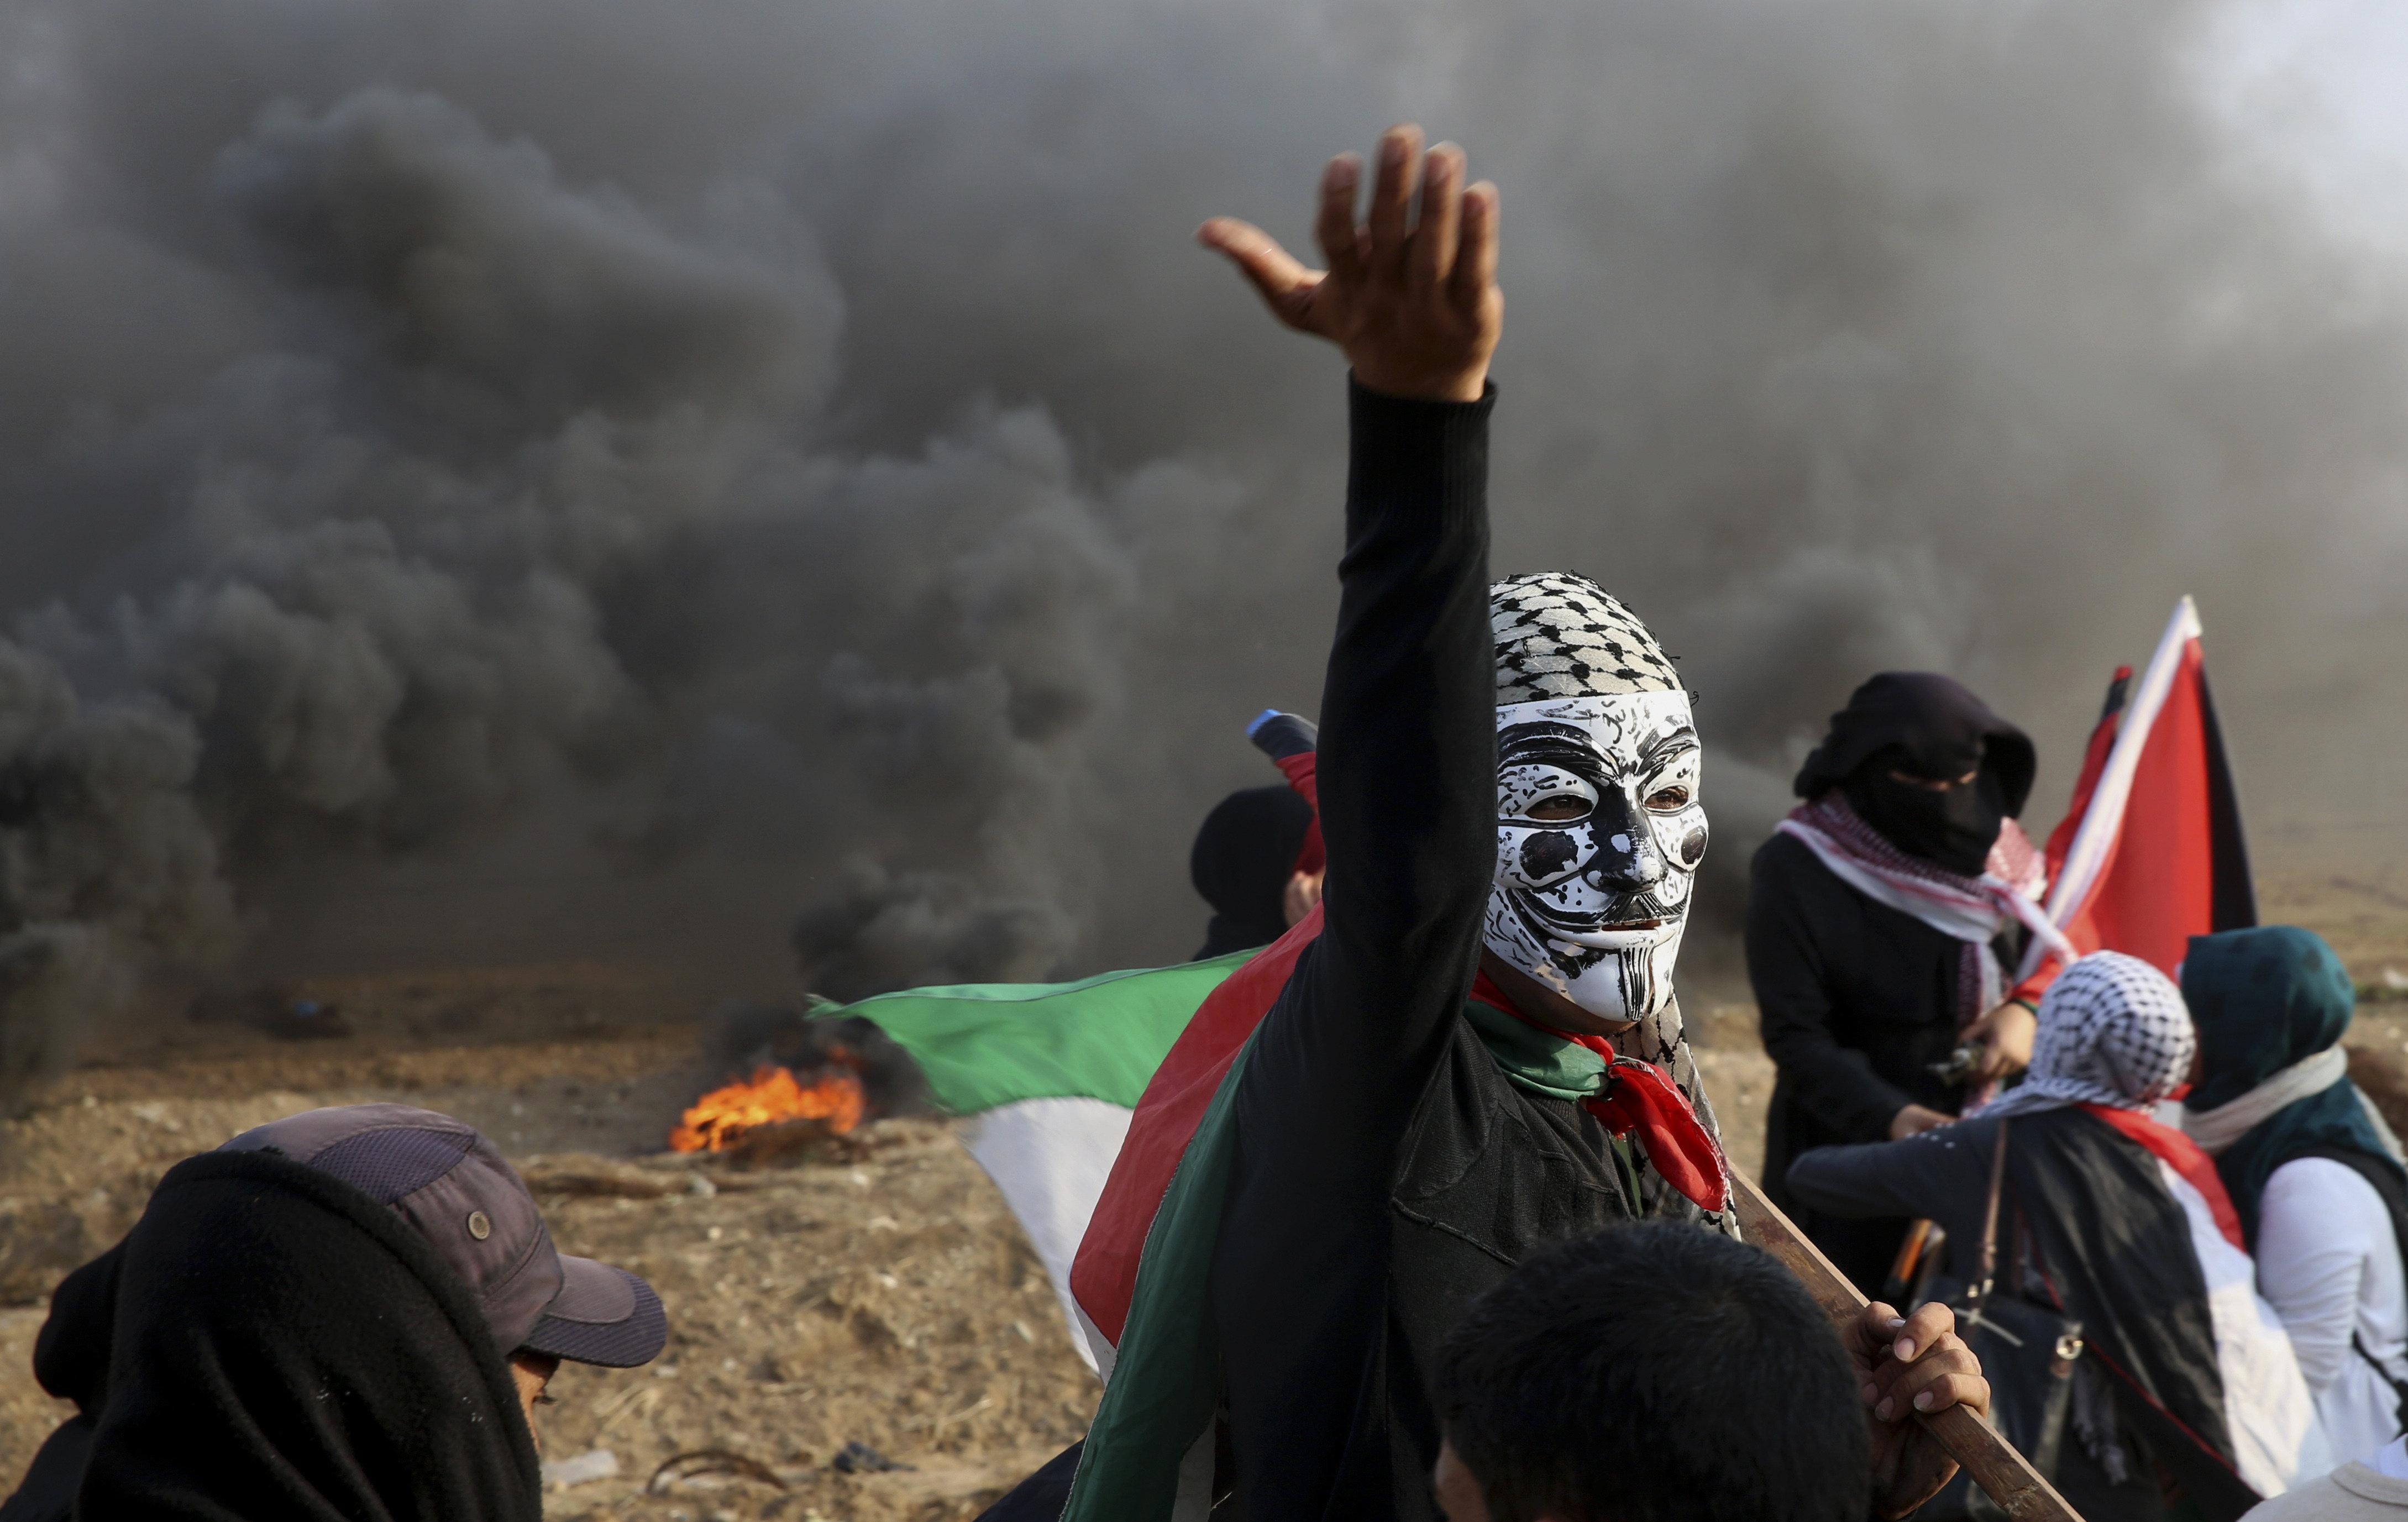 Echanges de tirs meurtriers avec Tsahal à Gaza, Netanyahu écourte sa visite à